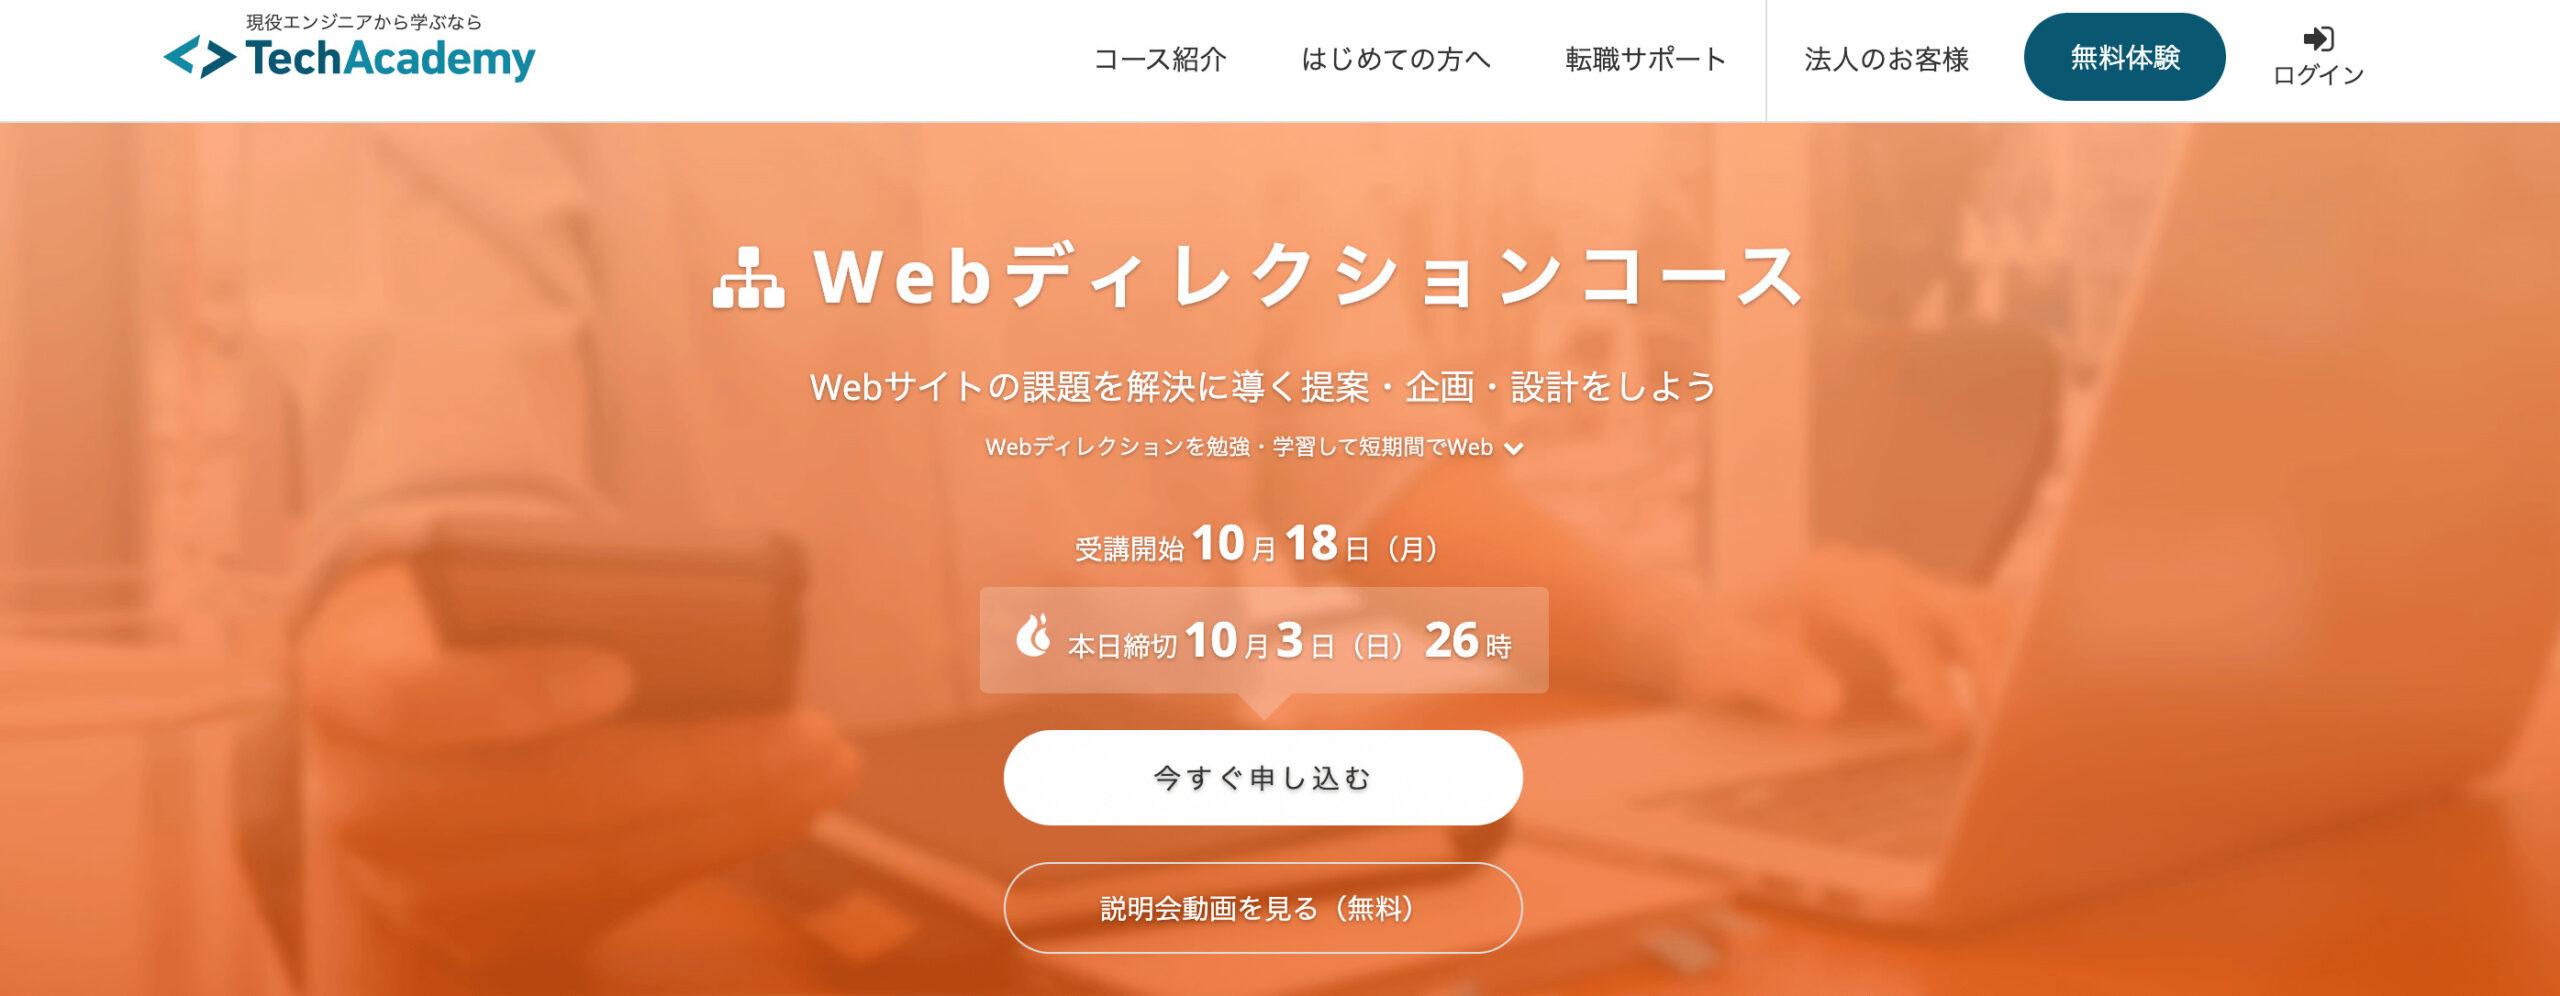 TechAcademy Webディレクションコース